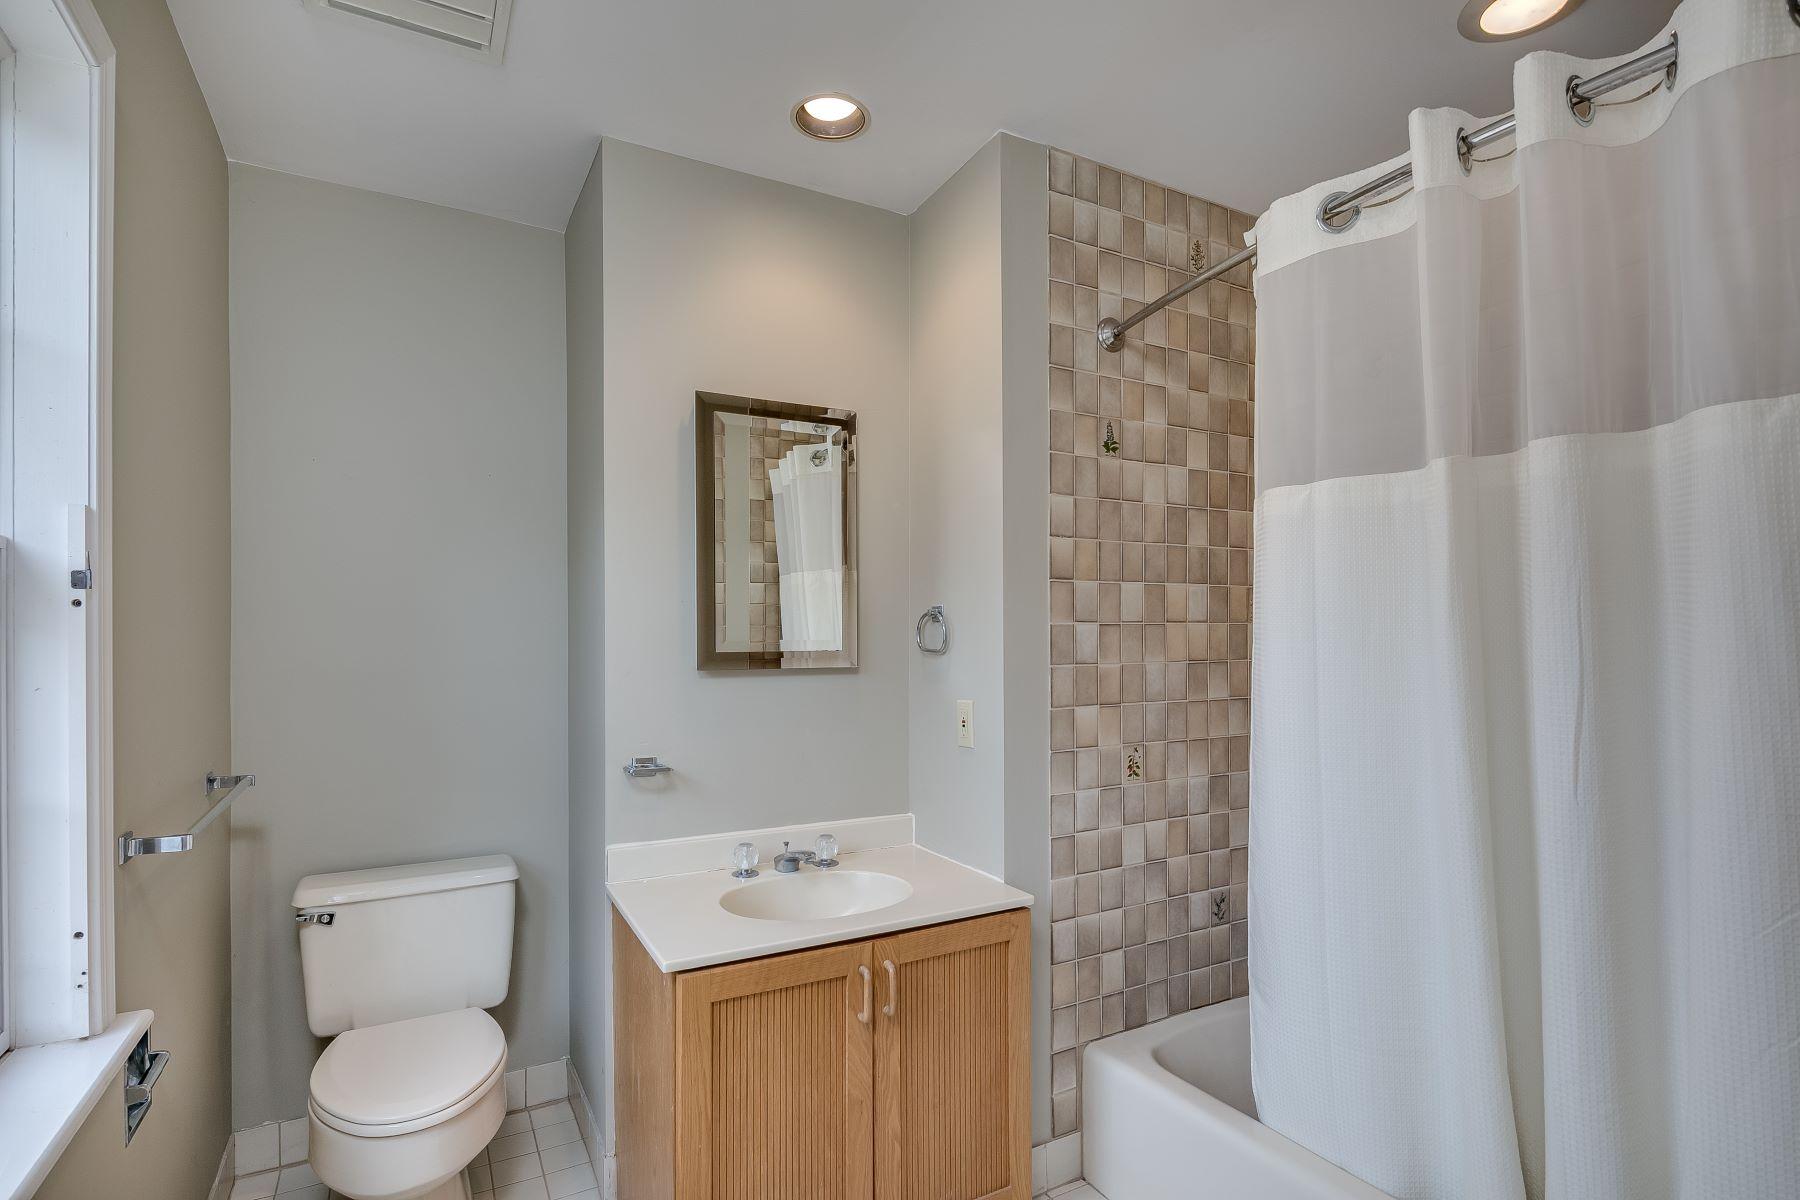 Additional photo for property listing at Opportunity in prestigious Winston Farm Estates 7 Winston Farm Lane Mendham, New Jersey 07945 United States